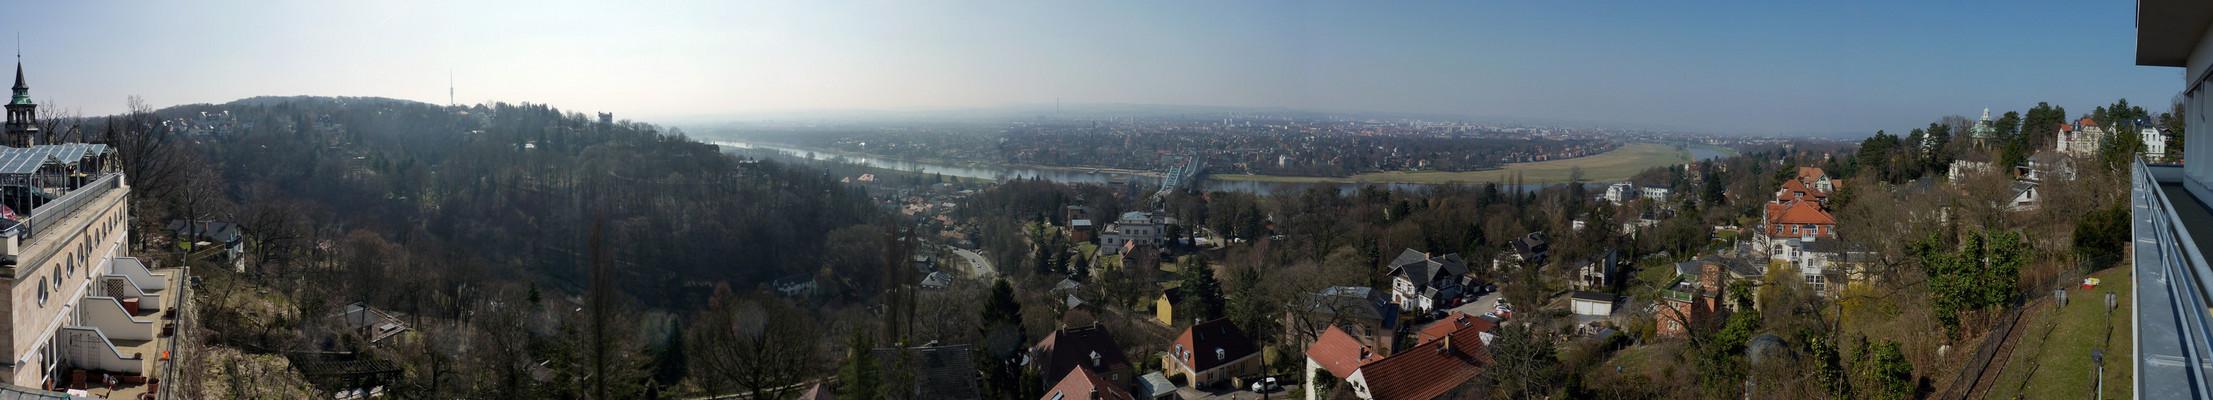 Dresden - Blick vom Luisenhof